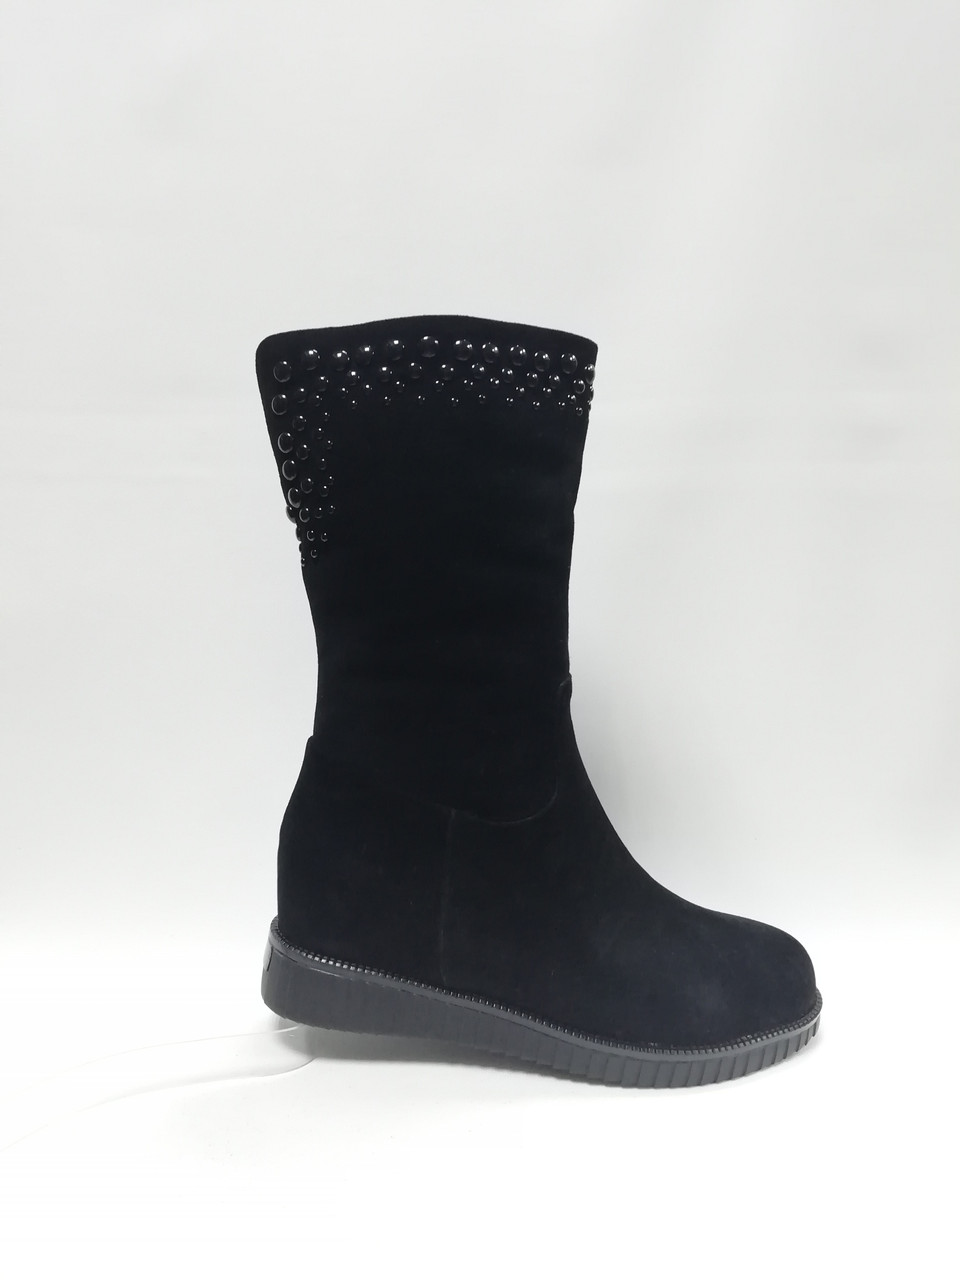 Зимние ботиночки (полусапоги) на толстой подошве .